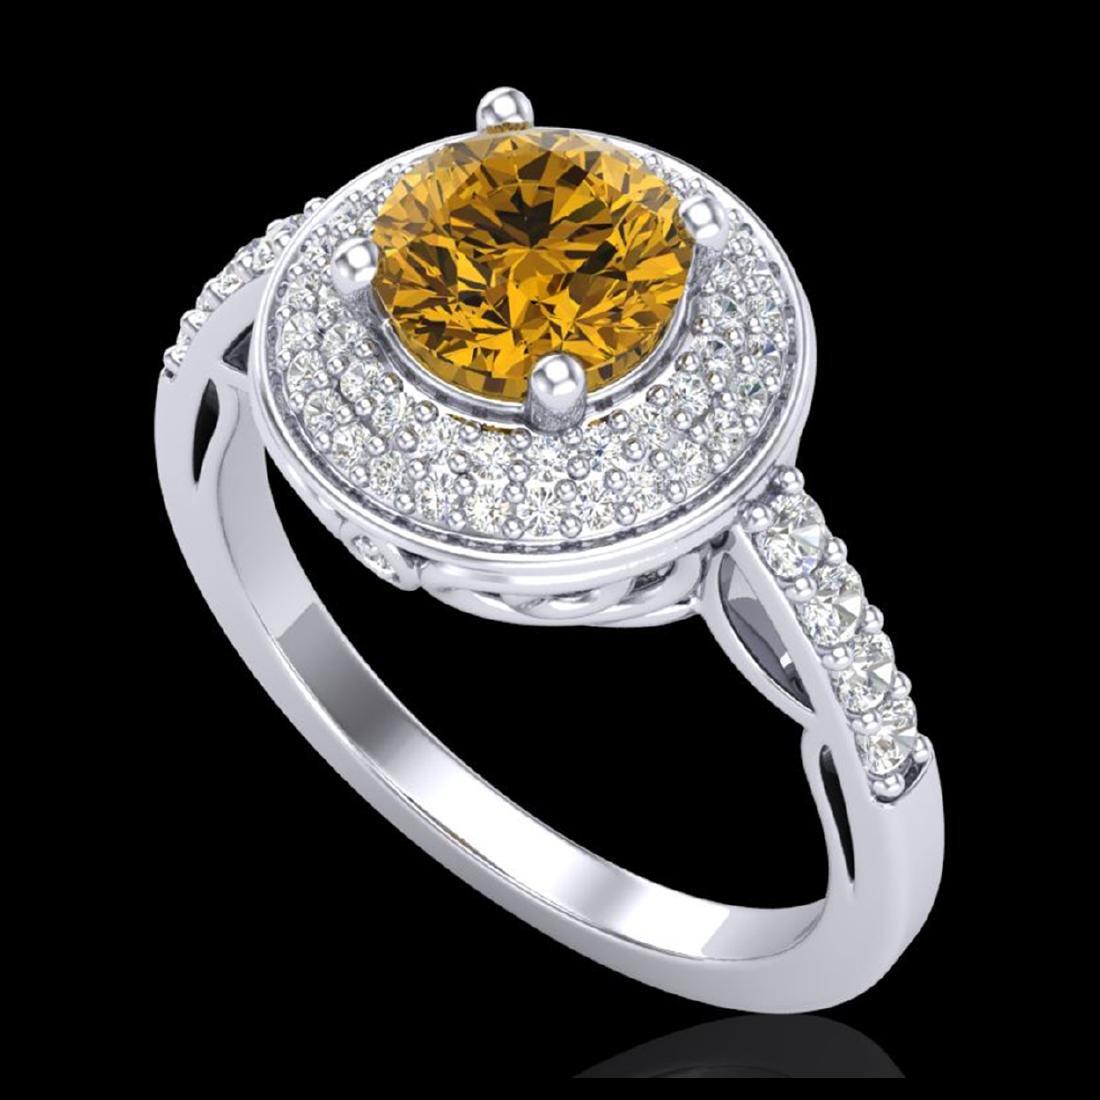 1.70 ctw Intense Fancy Yellow Diamond Art Deco Ring 18K